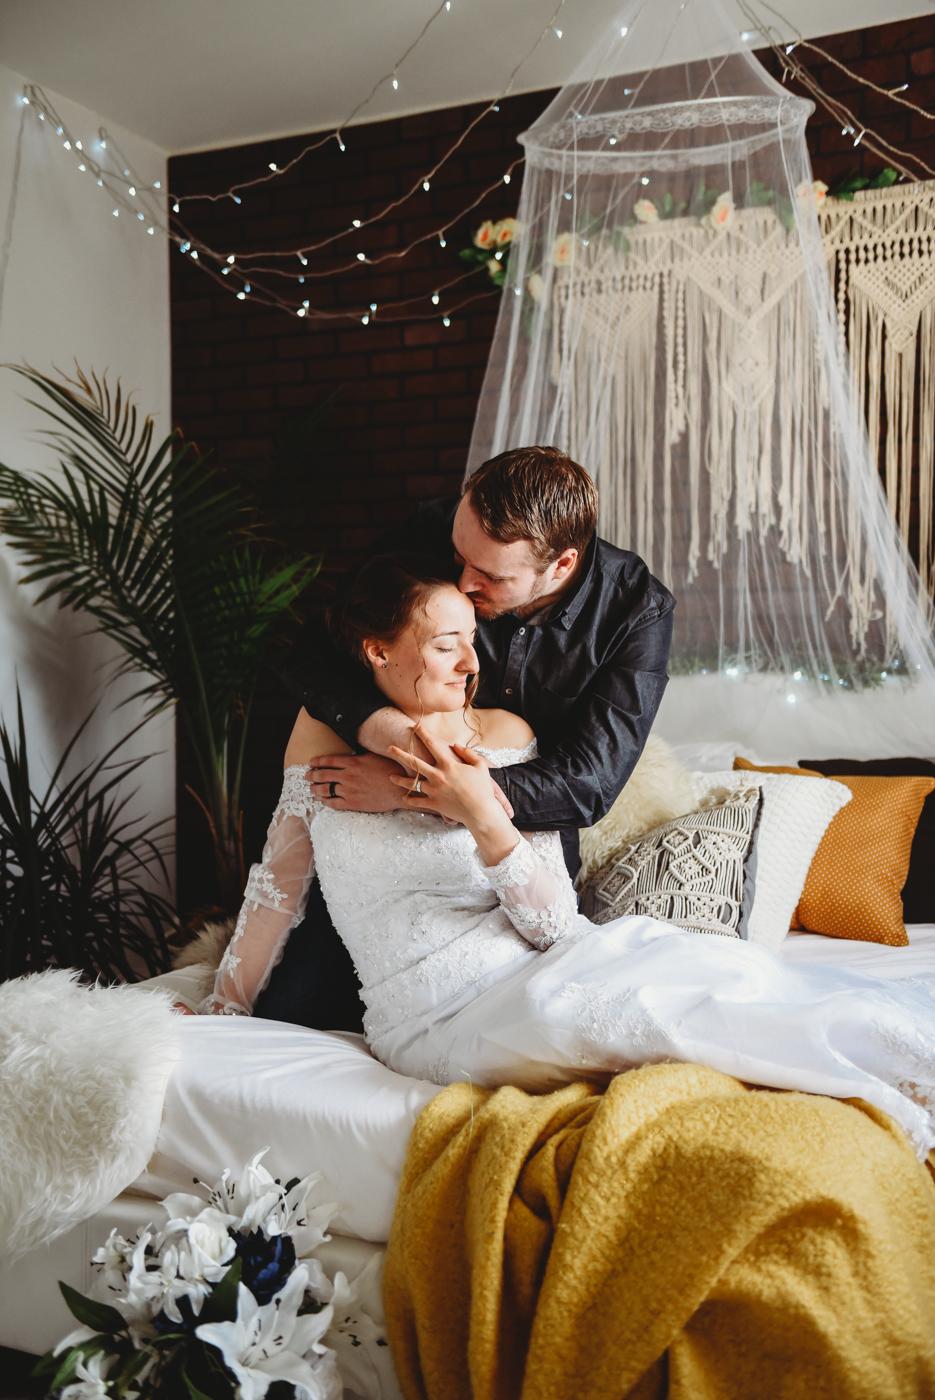 FortSt.John_photographer_TyraEPhotography_Wedding_Couple_Family_Photograhy_DawsonCreek_Elopement_Bride_Boduoir_Portraits-7.jpg